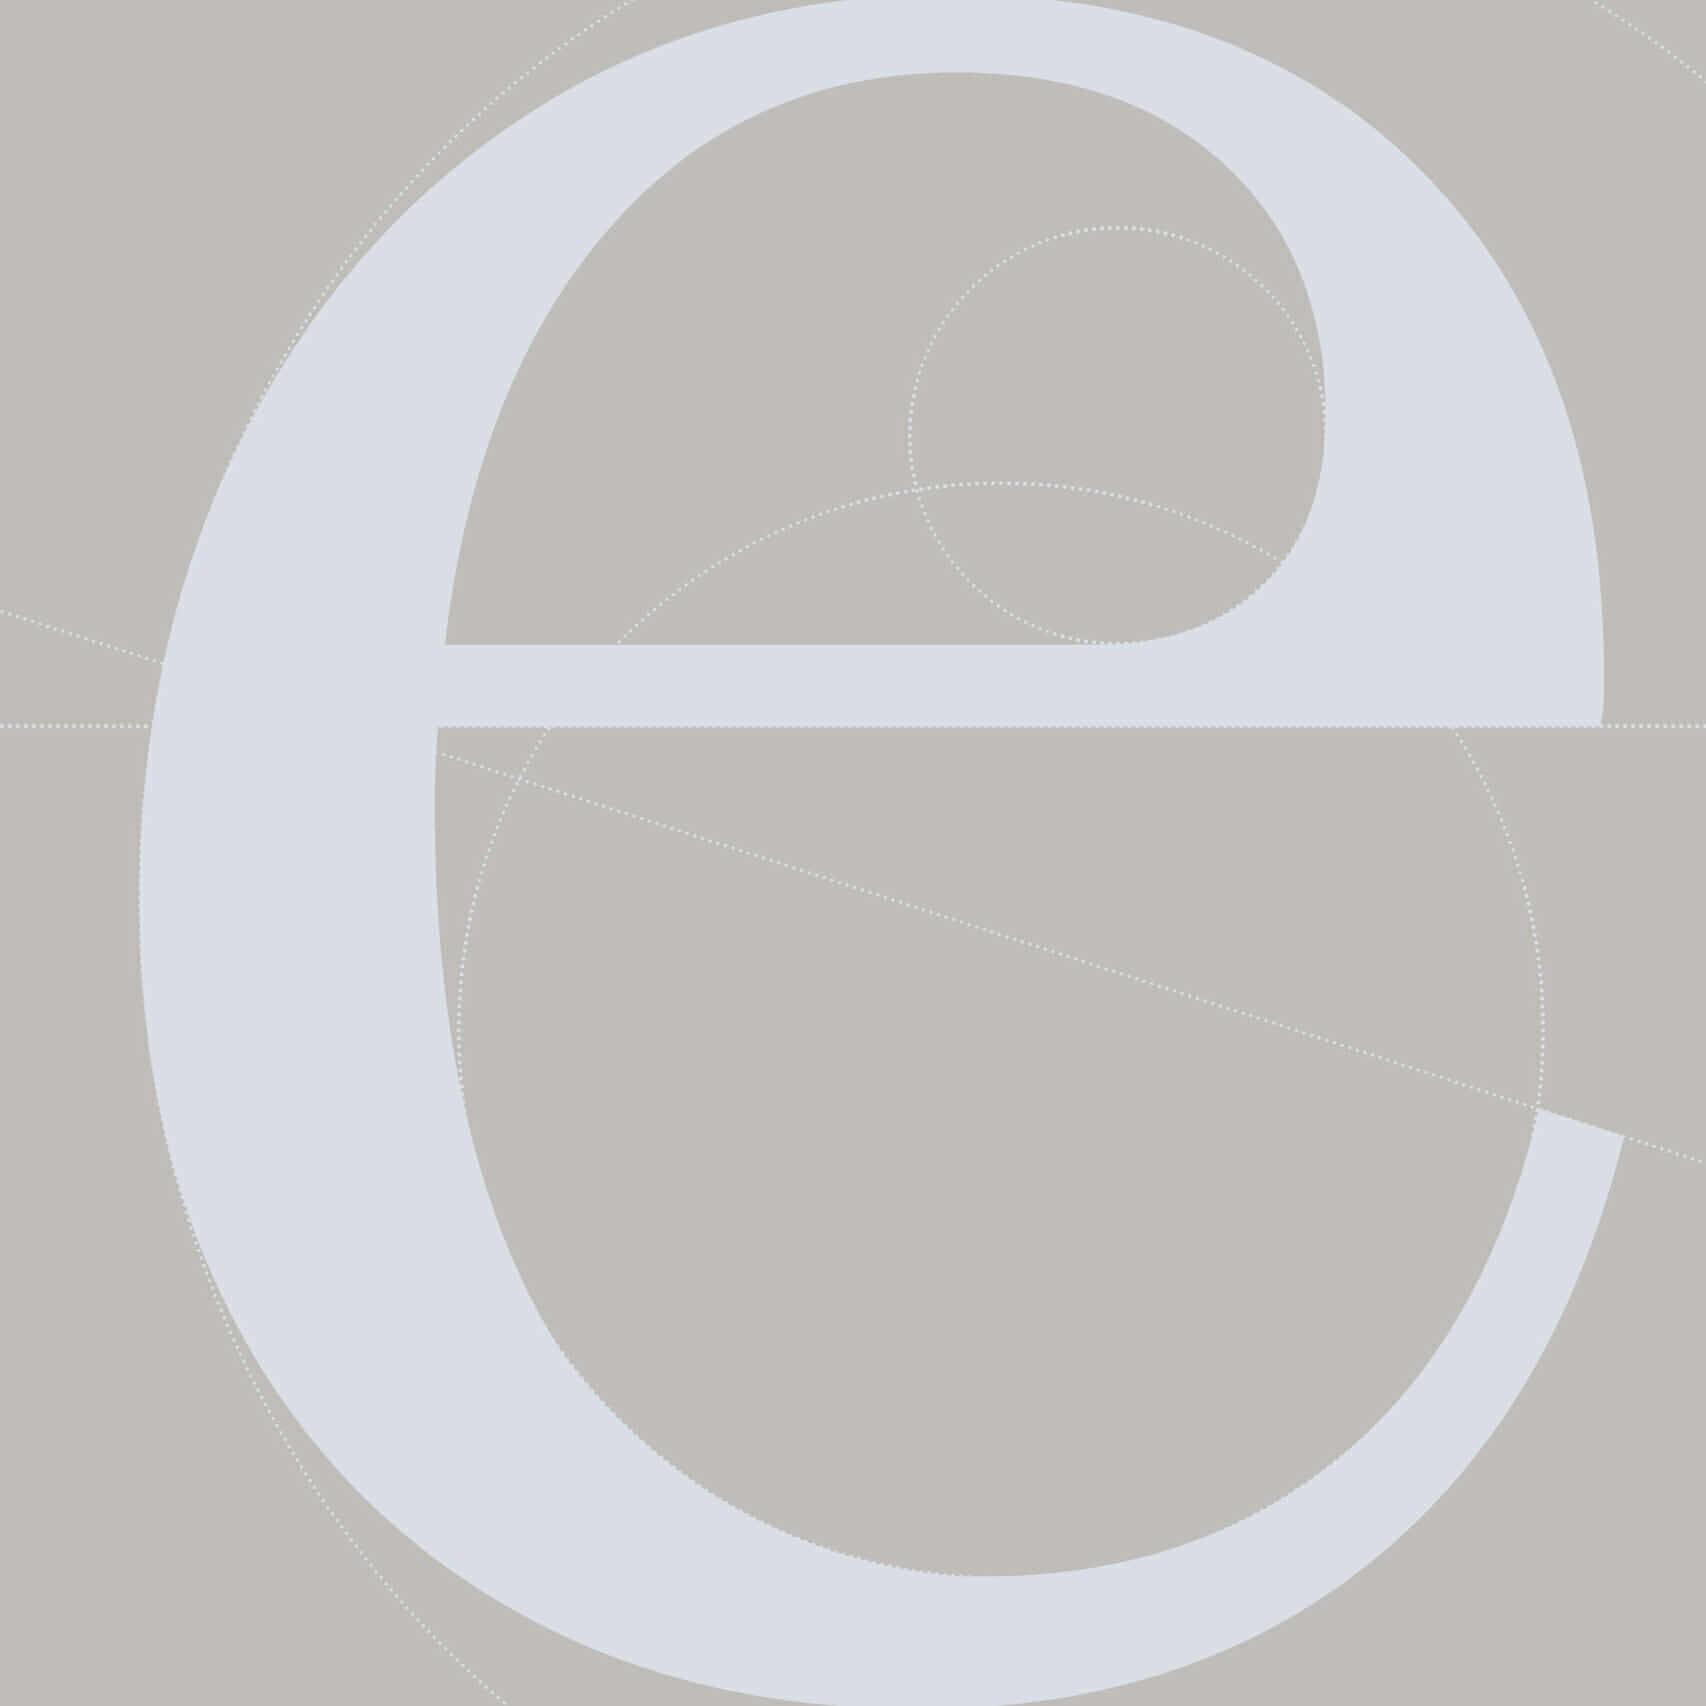 AI_Moet-Hennessy_LR_5-square